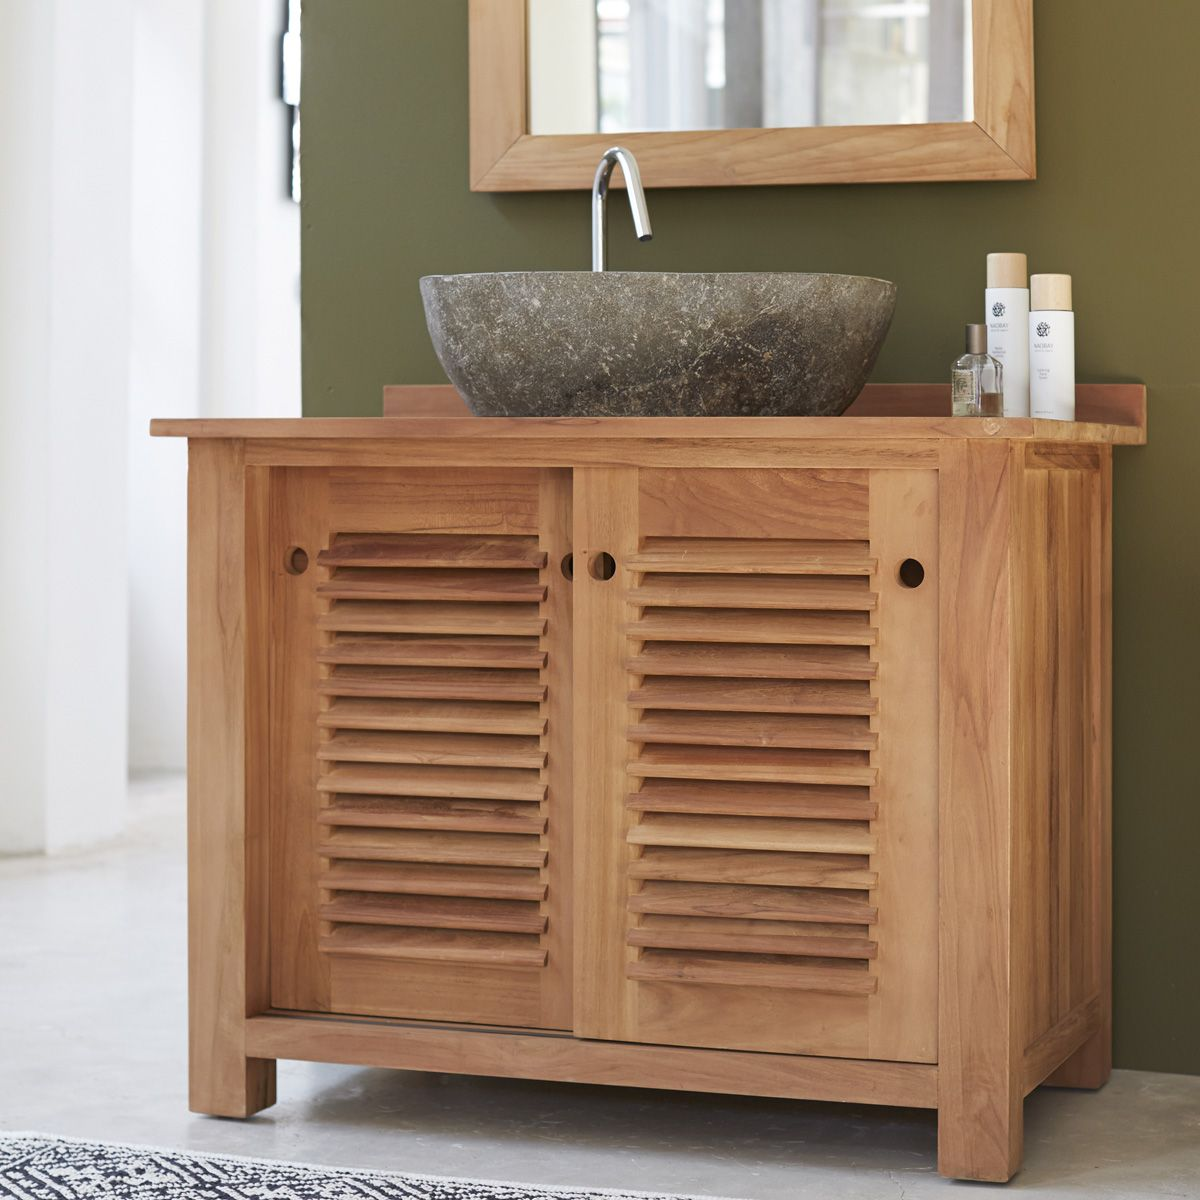 meuble salle de bain porte persienne